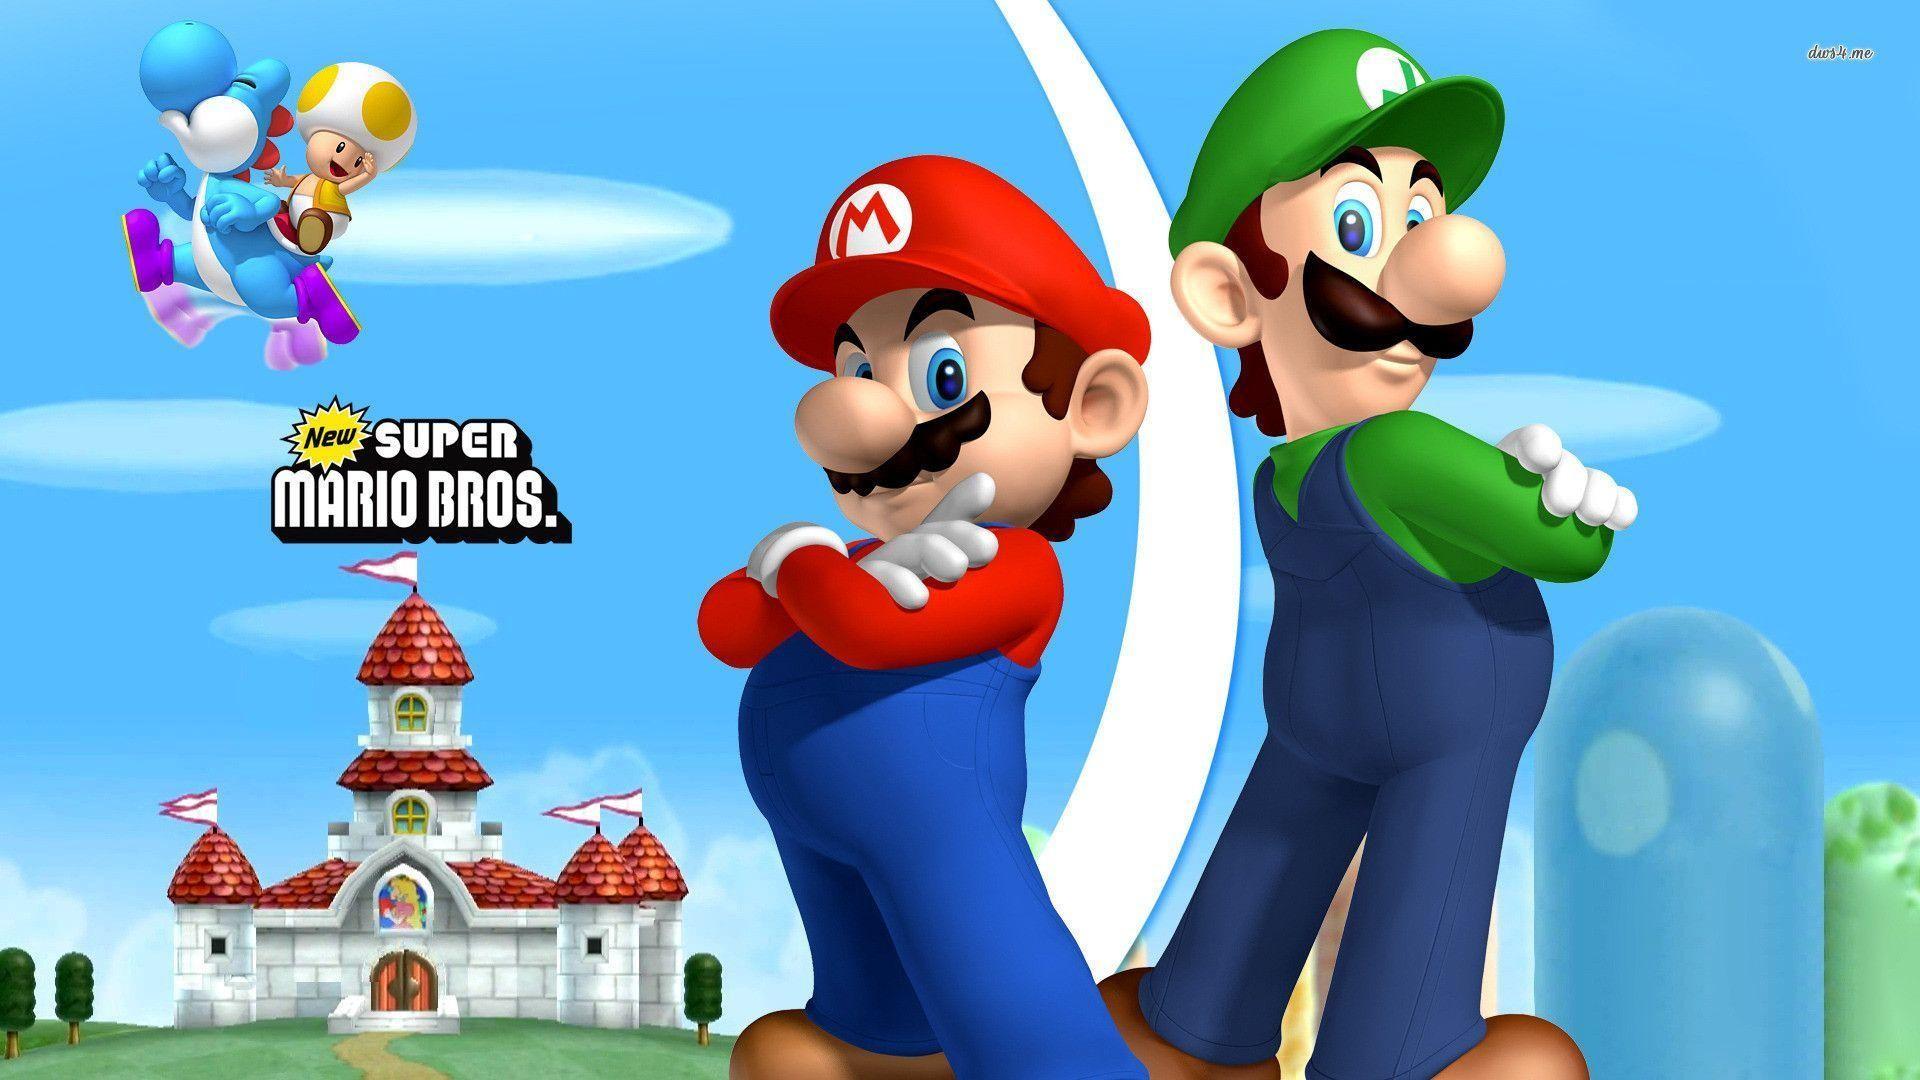 Mario and Luigi Backgrounds (54+ images)